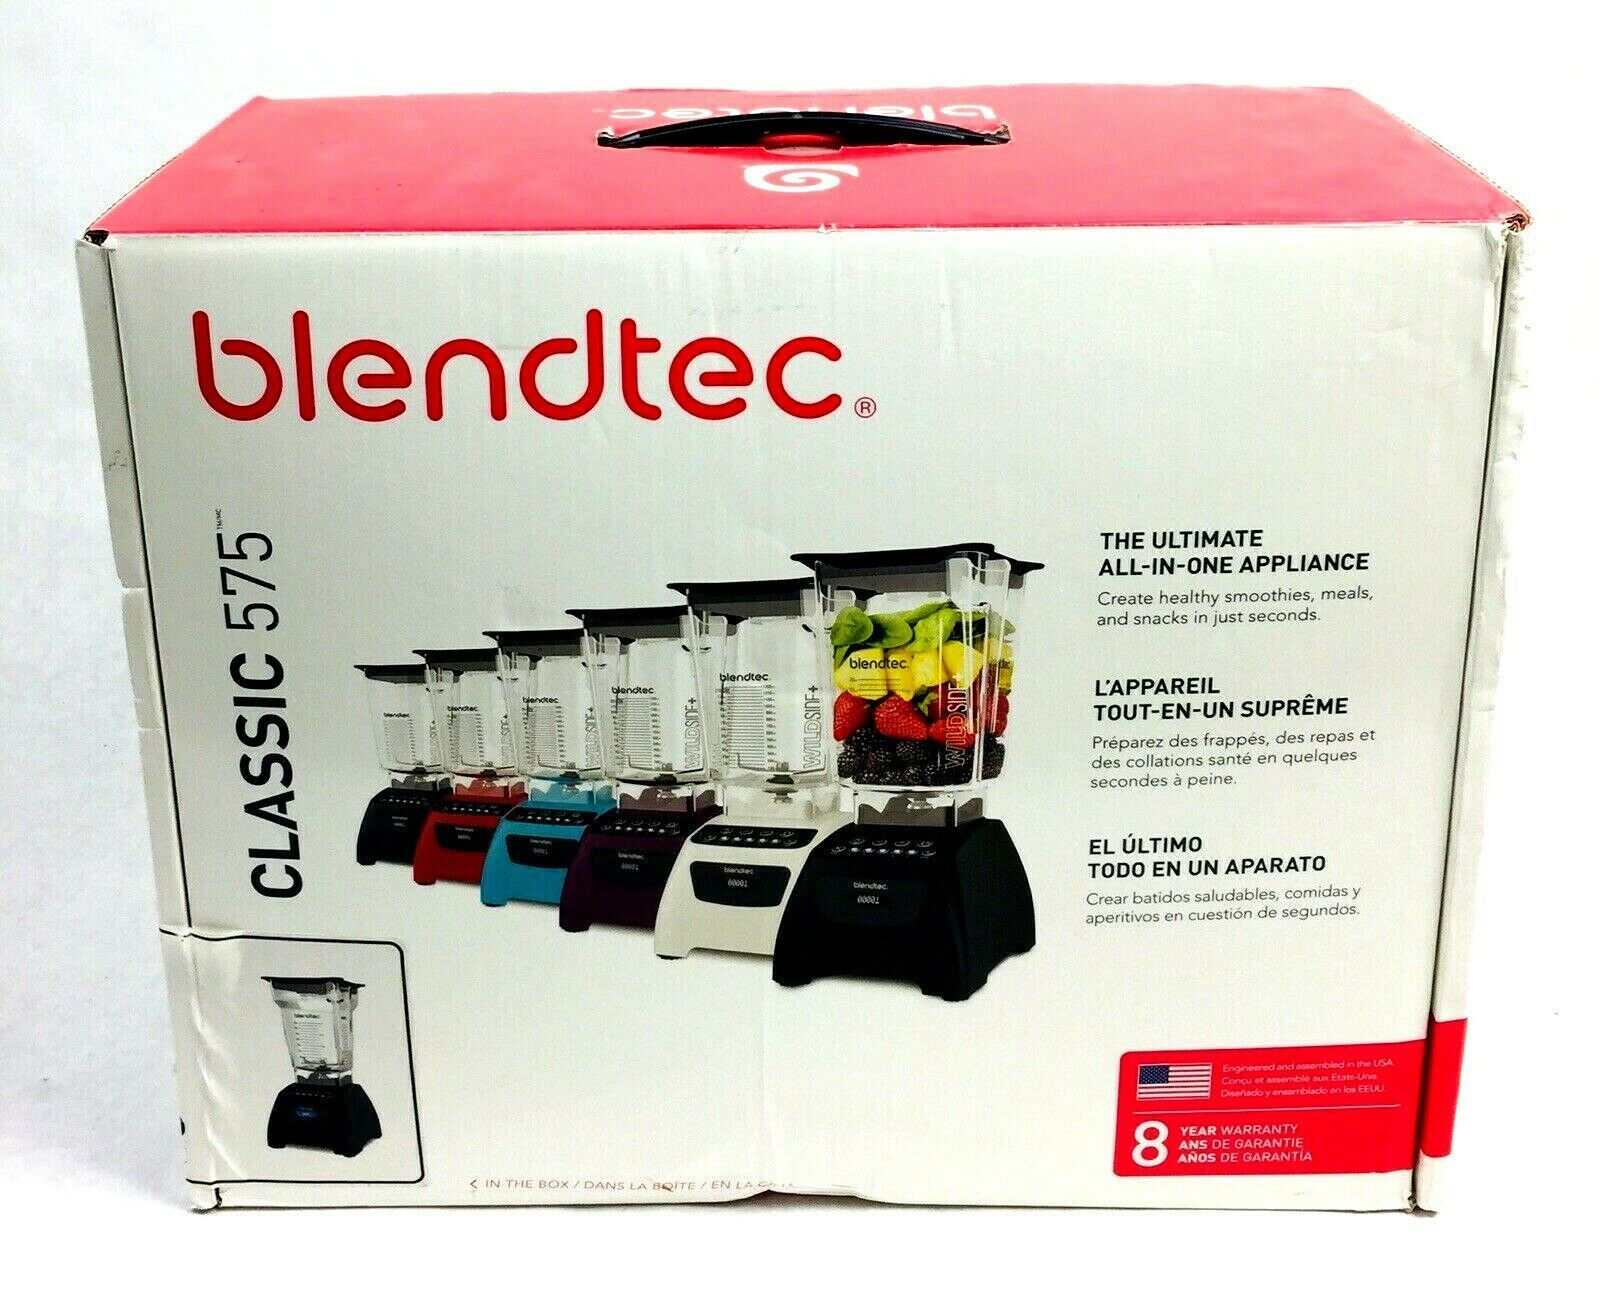 Blendtec Classic 575 Blender w/ FourSide Jar 2 Qt. Black